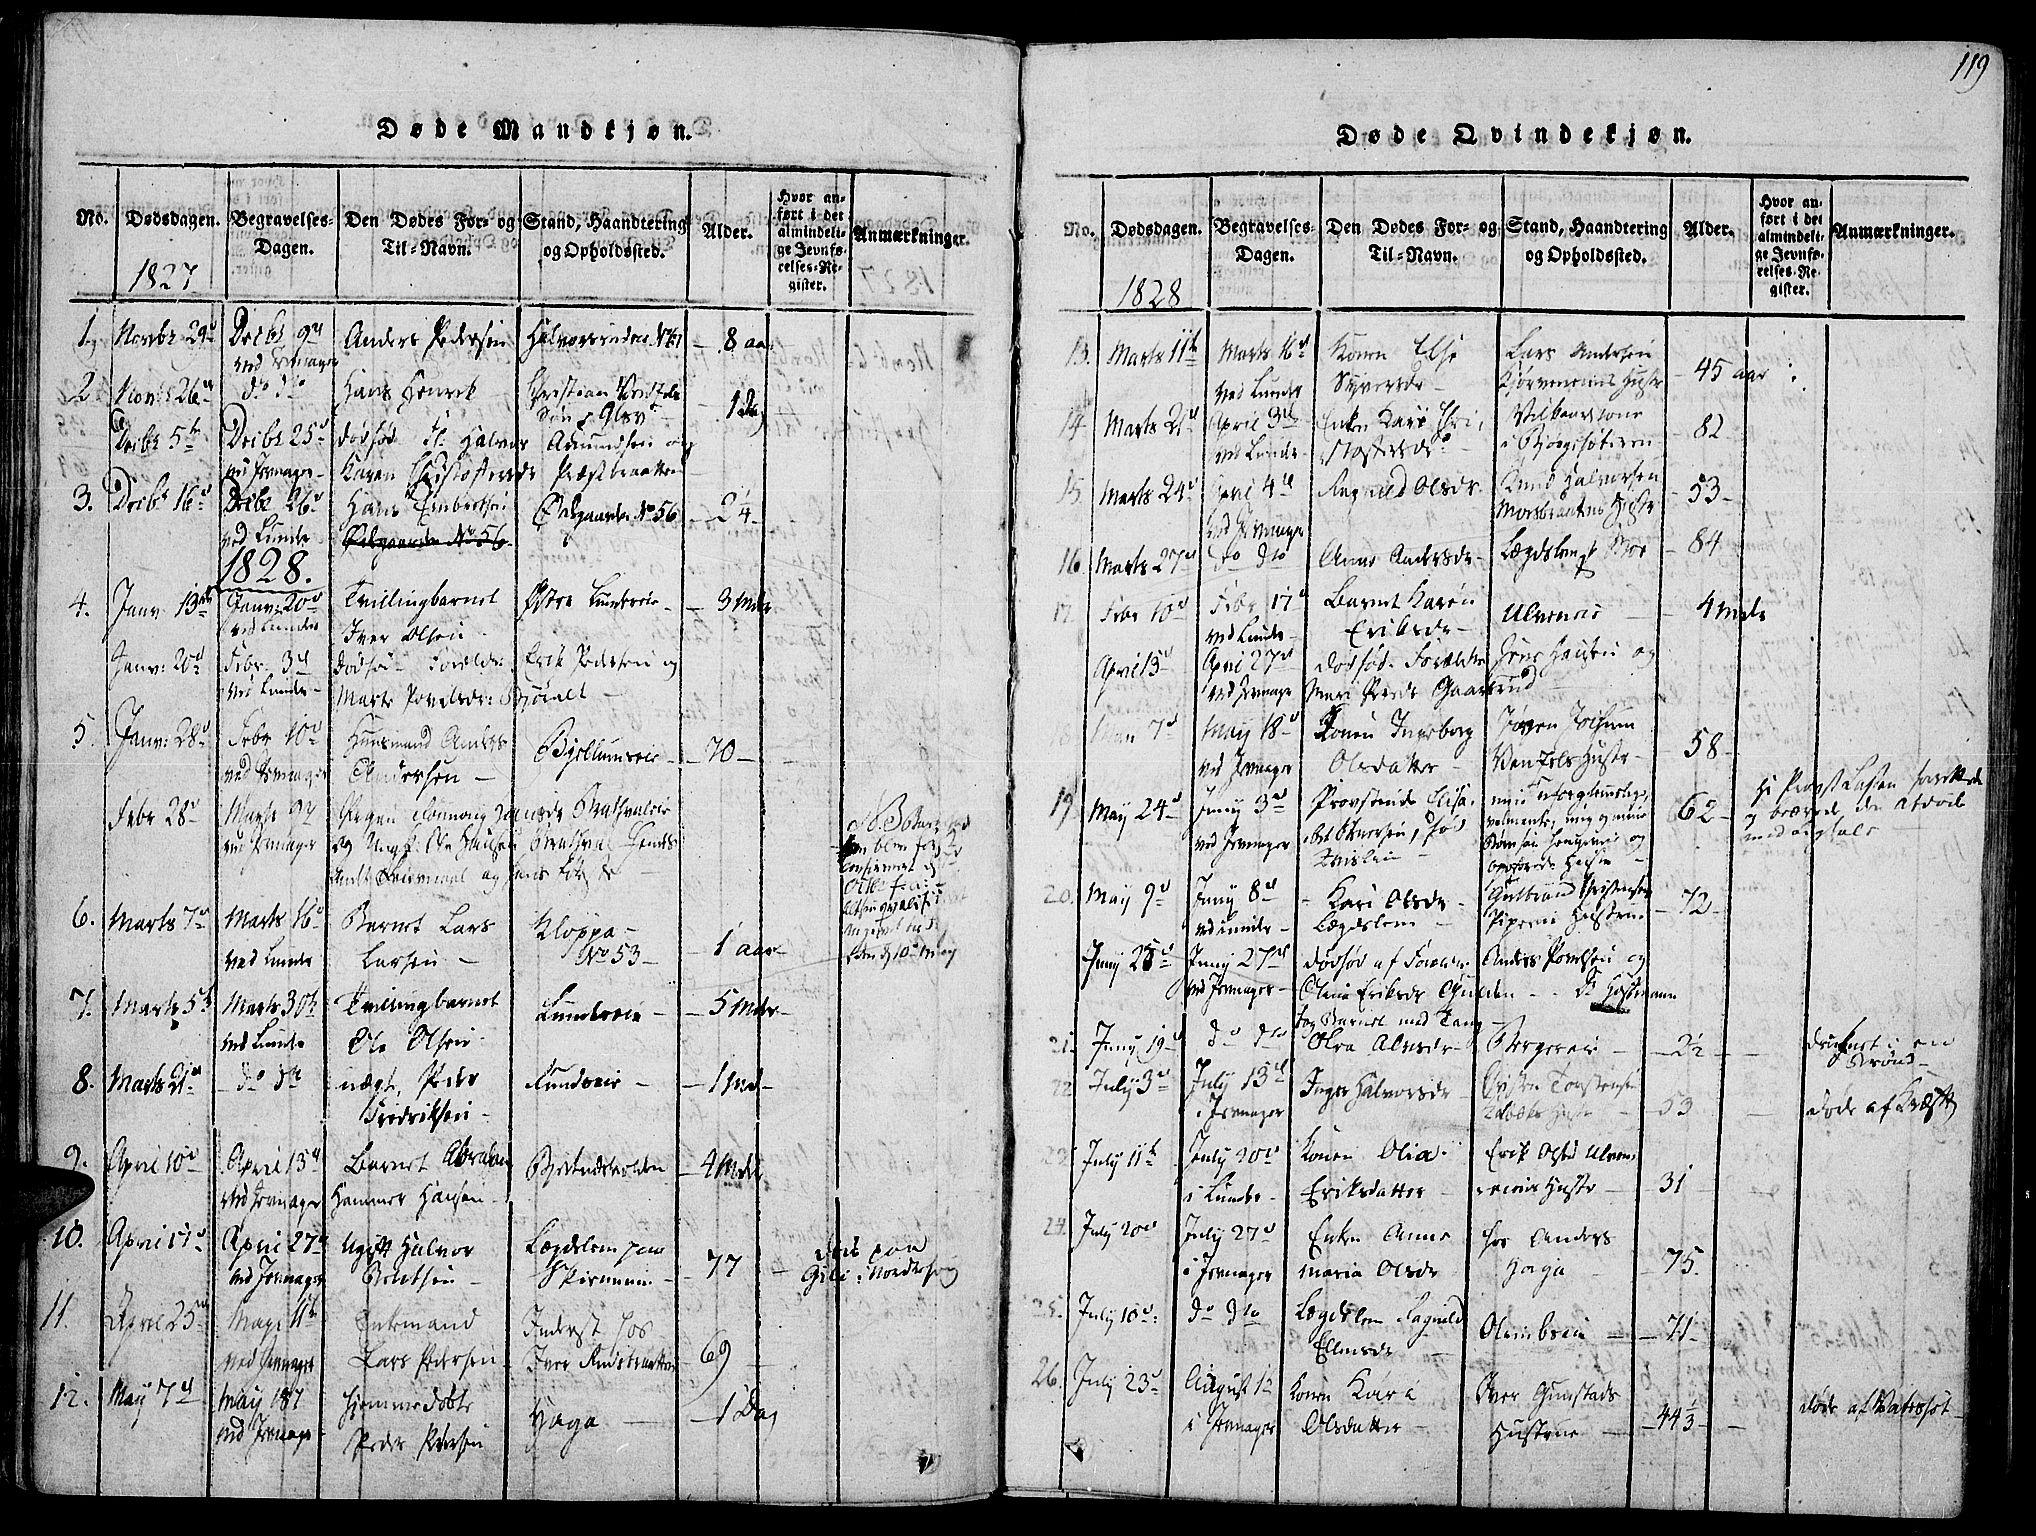 SAH, Jevnaker prestekontor, Ministerialbok nr. 5, 1815-1837, s. 119